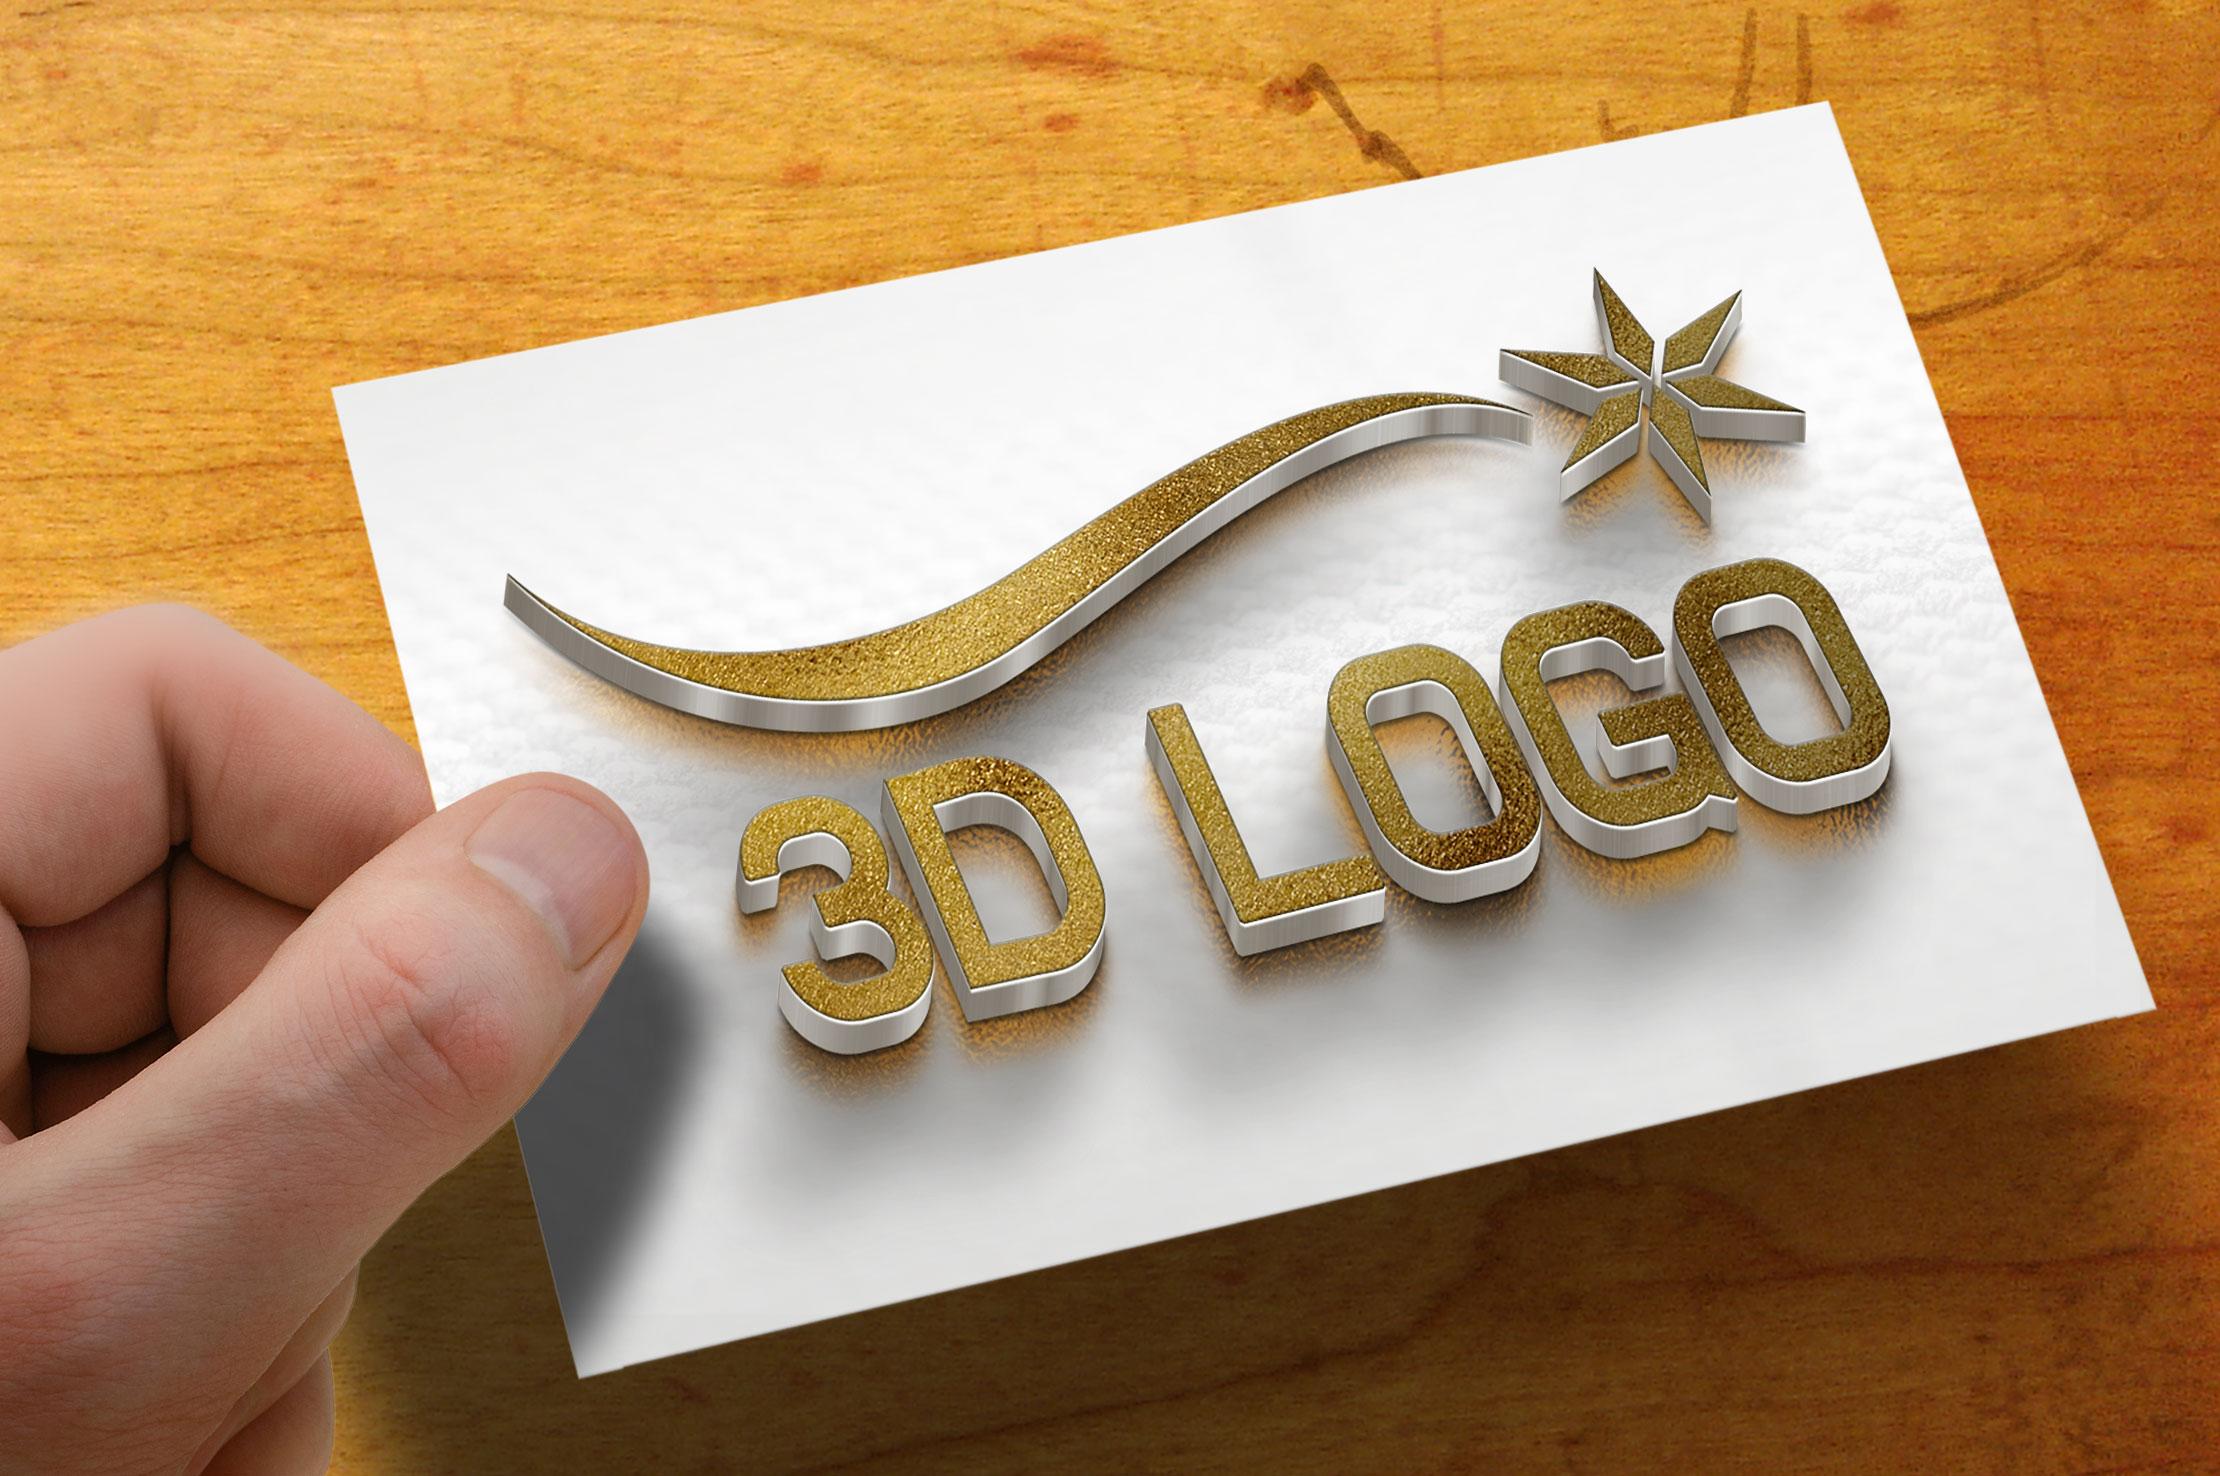 2220x1476 Online Platform Offer Simple 3d Logo Maker For Users To Create 3d